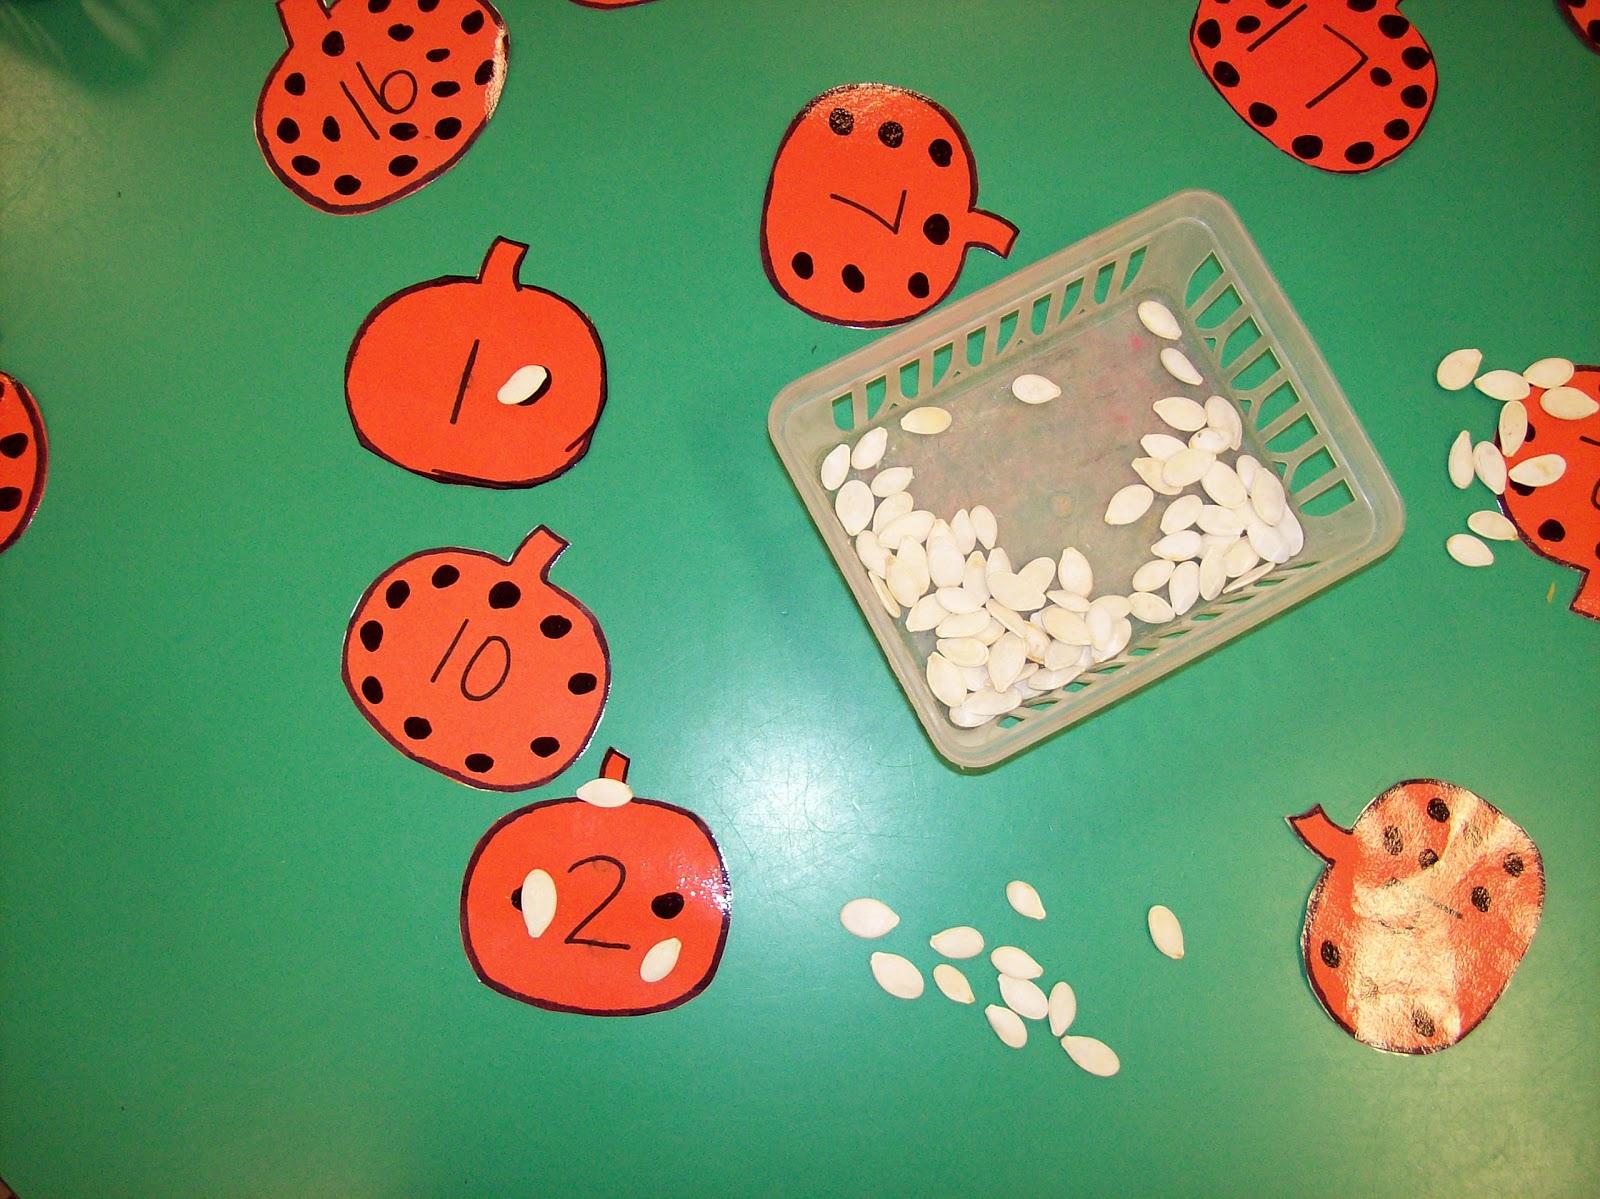 pumpkin preschool activities learning and teaching with preschoolers more pumpkins 234